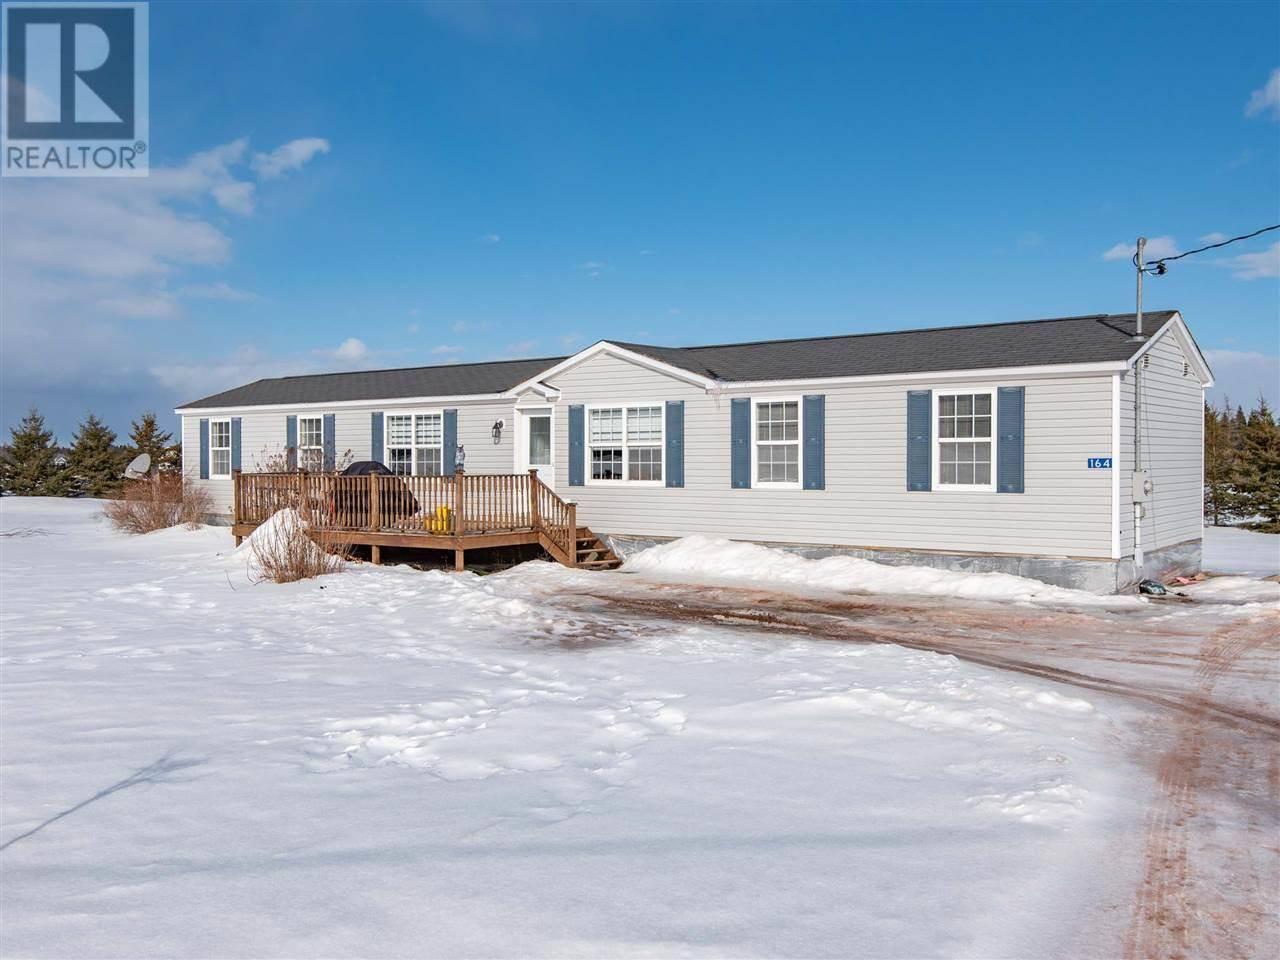 Home for sale at 164 Mckenna Rd Mermaid Prince Edward Island - MLS: 202003562